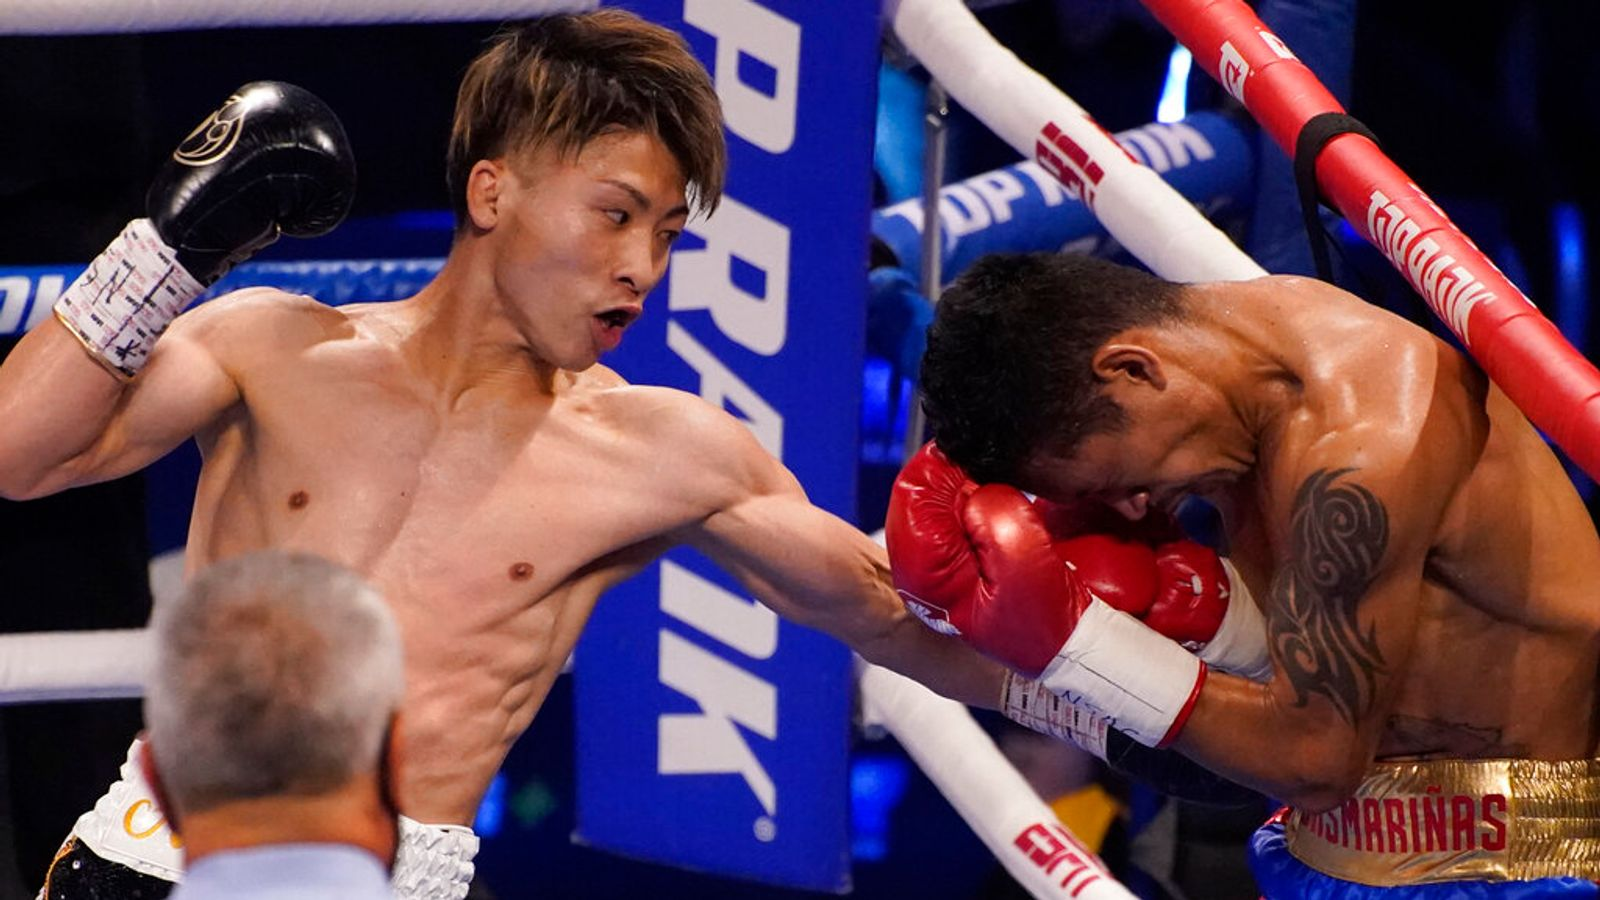 Naoya Inoue smashes Michael Dasmarinas with body shots to record KO win in world bantamweight title defence - Sky Sports